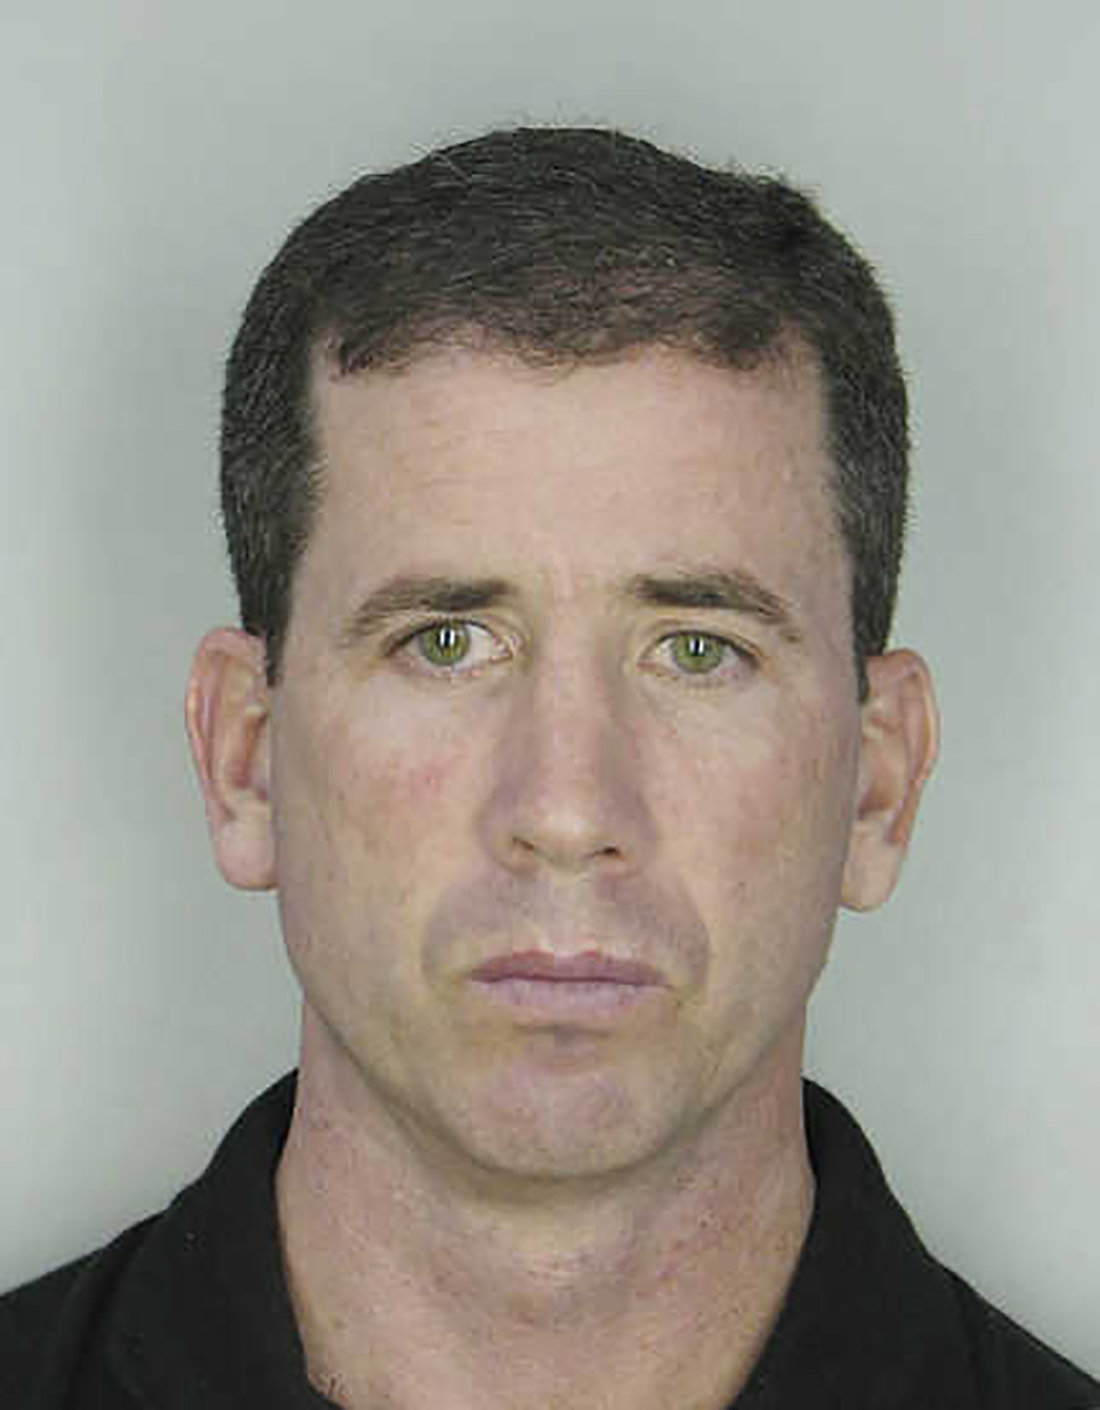 Mugshot of Tim DonaghyMugshot of Tim Donaghy